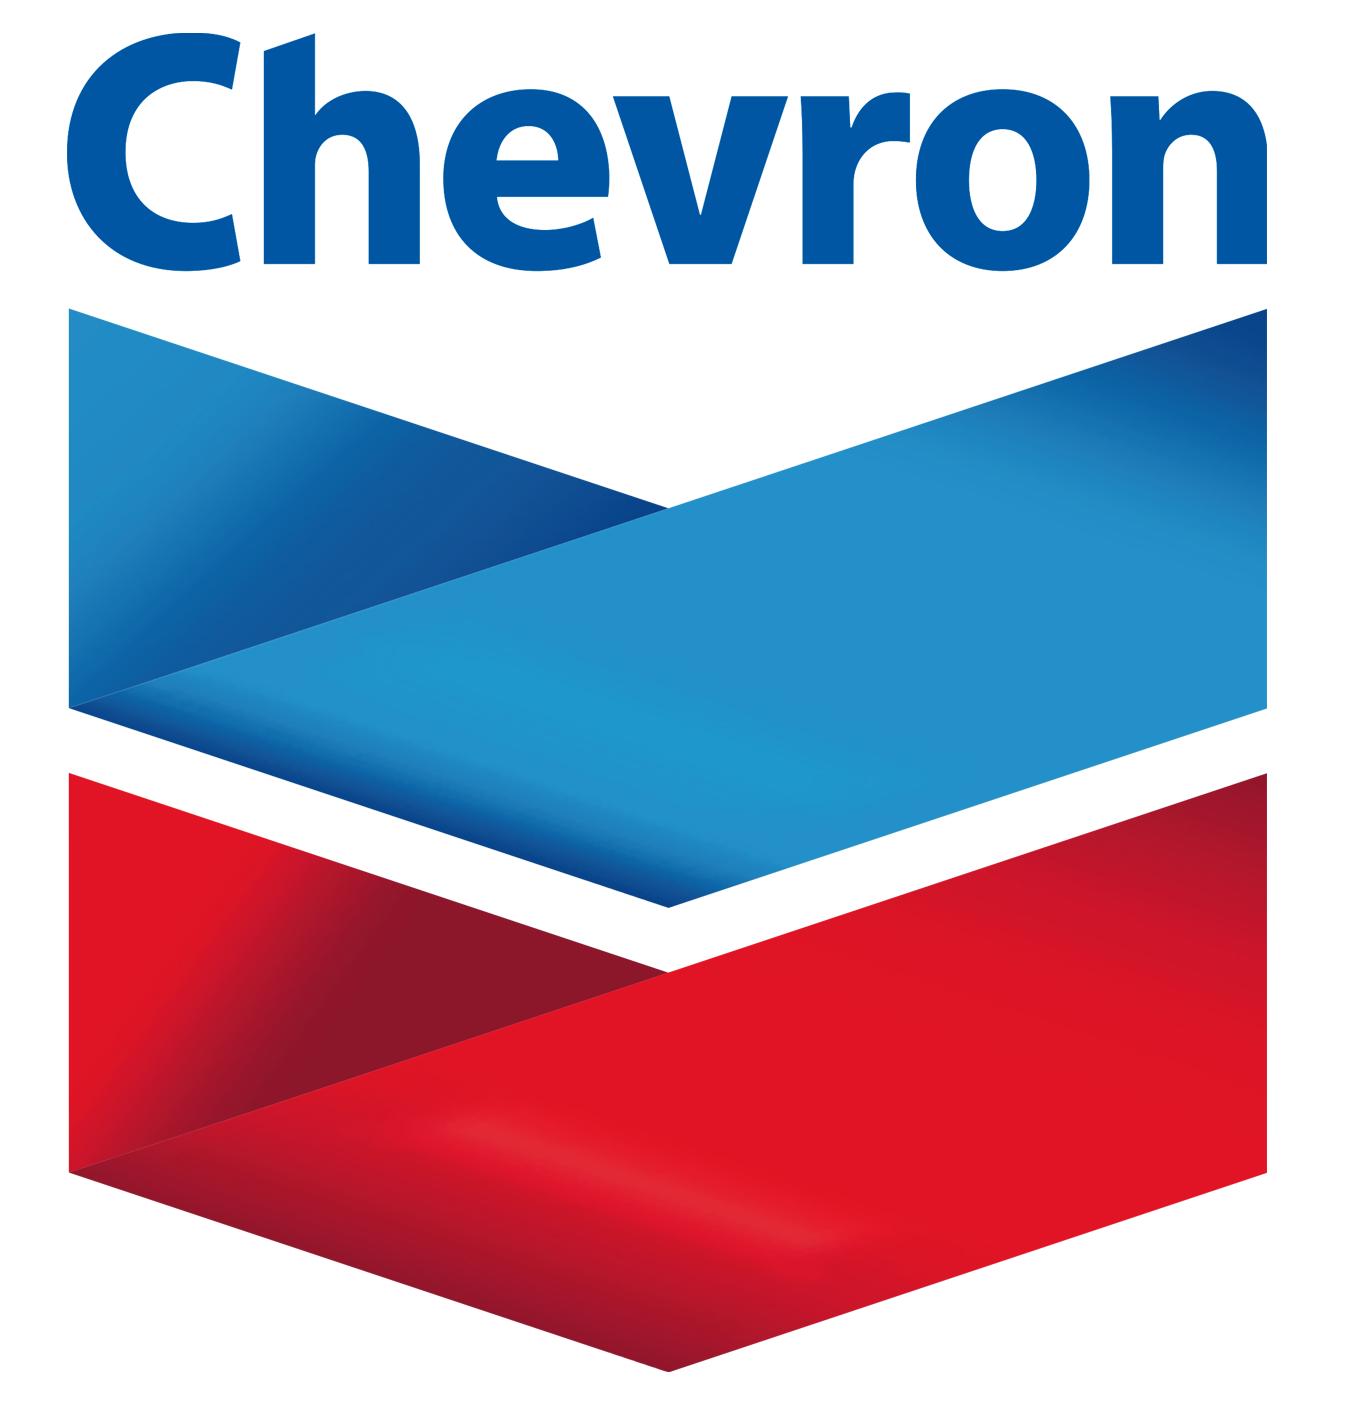 Chevron Way Oil Vistac ISO 220